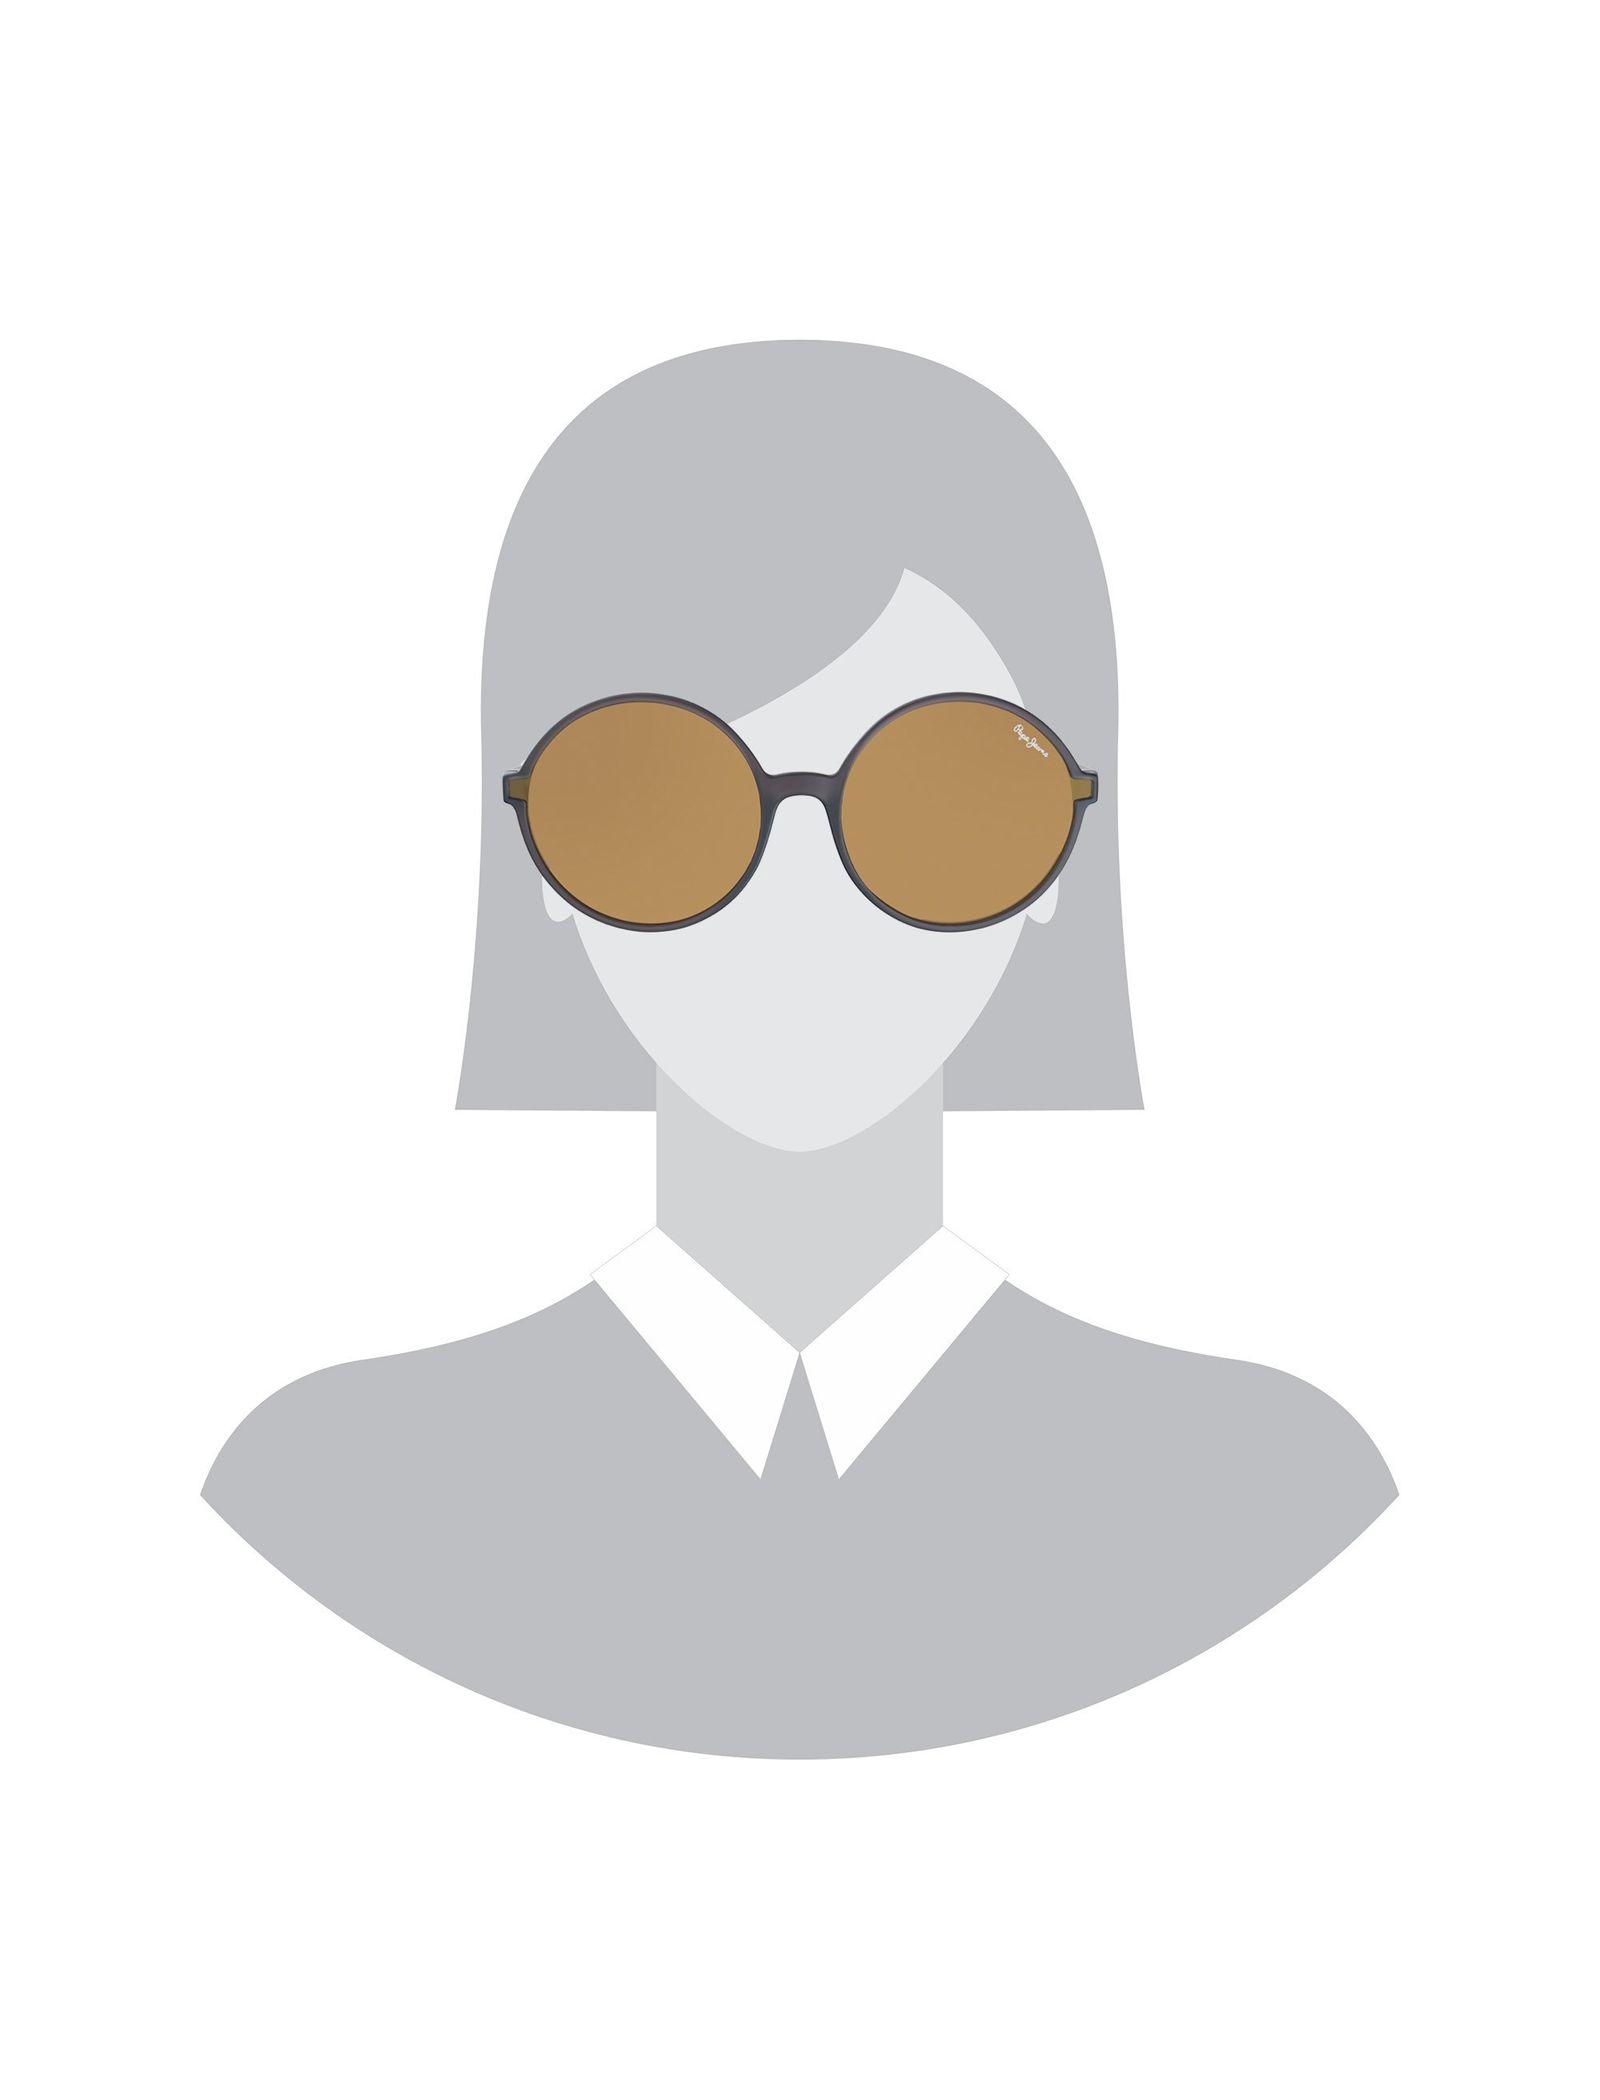 عینک آفتابی گرد زنانه - پپه جینز - زغالي - 5